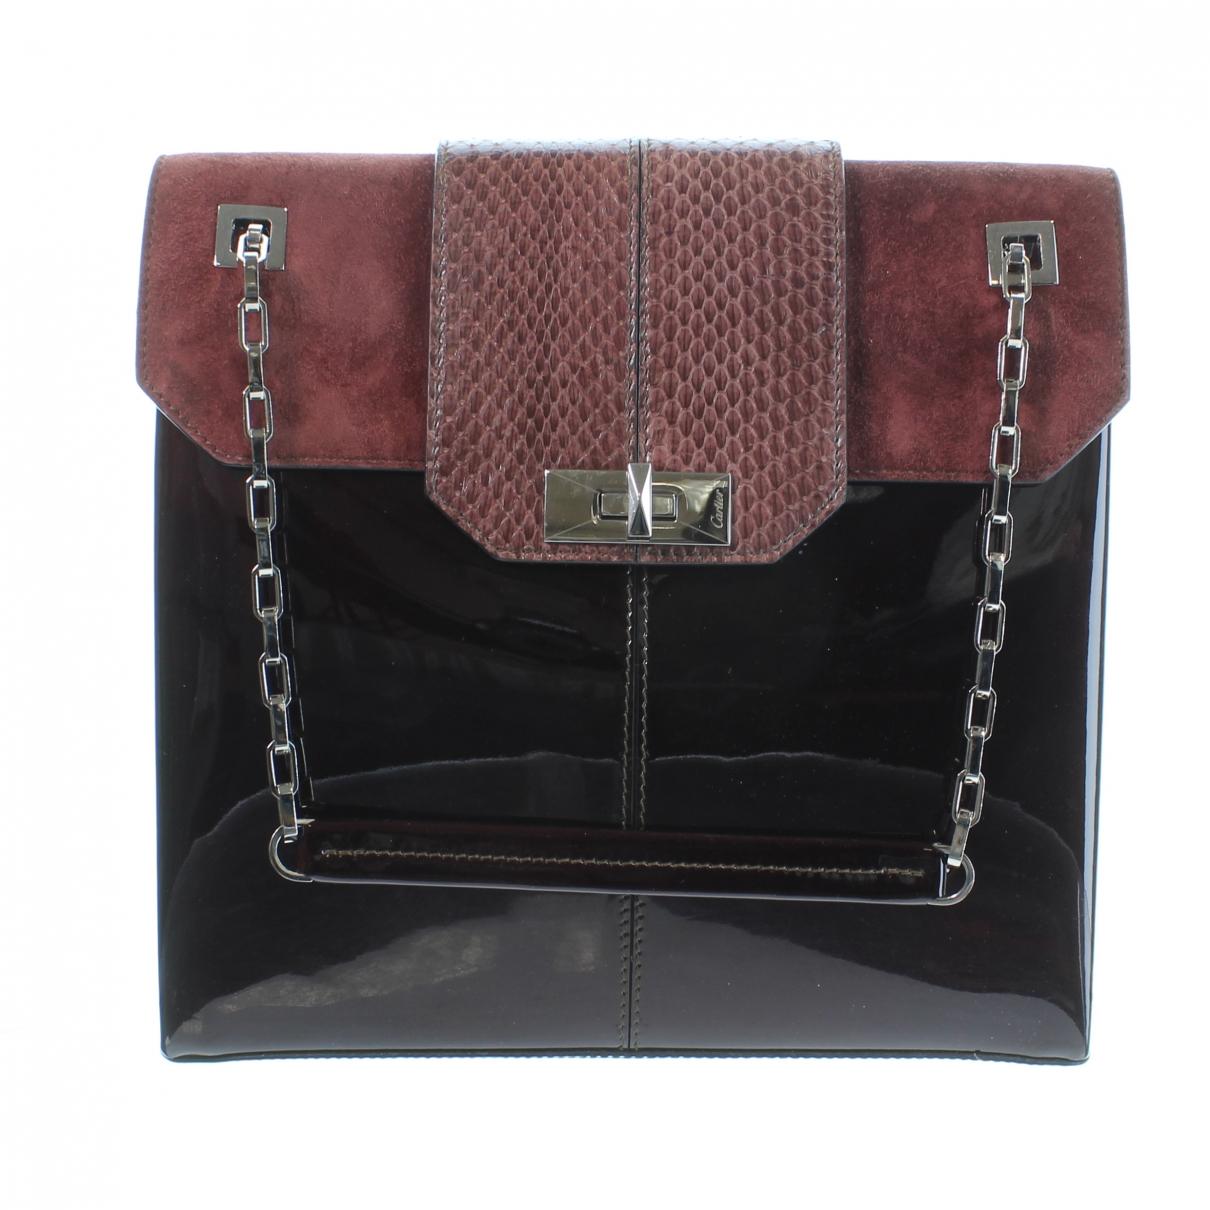 Cartier \N Burgundy Patent leather handbag for Women \N